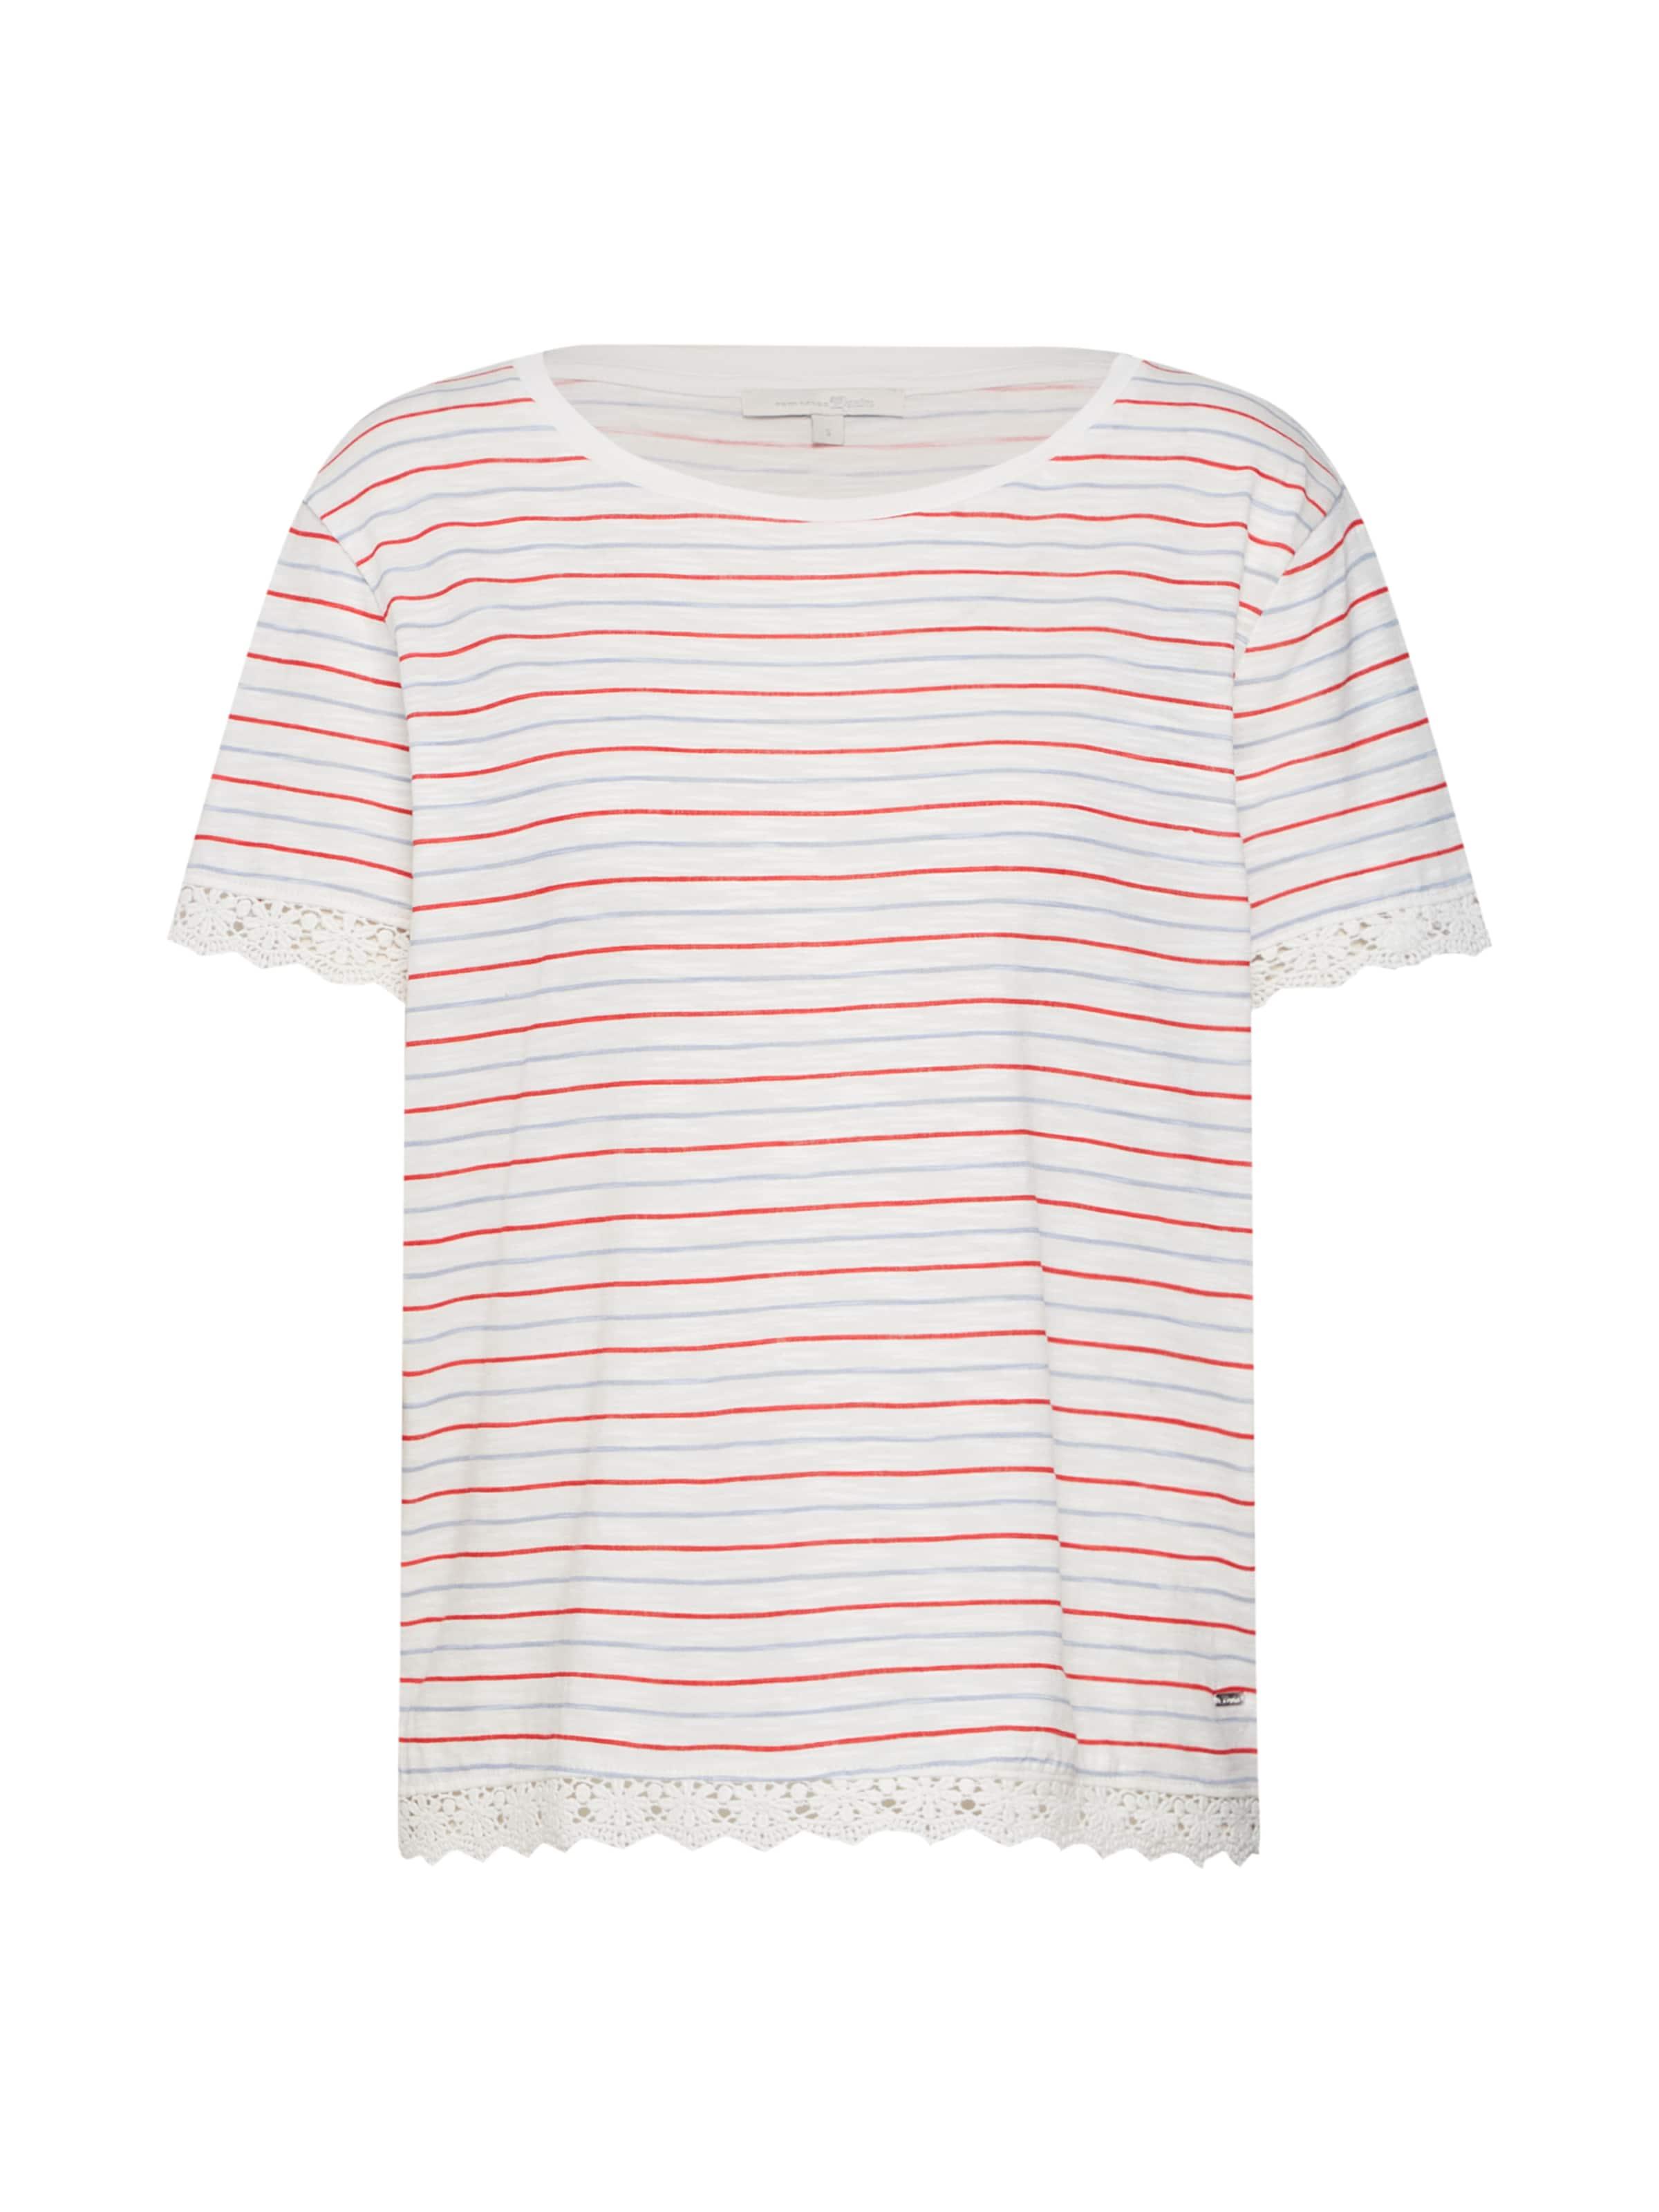 In TaubenblauRot Tailor Denim Tom Shirt Weiß eW9ID2YEHb